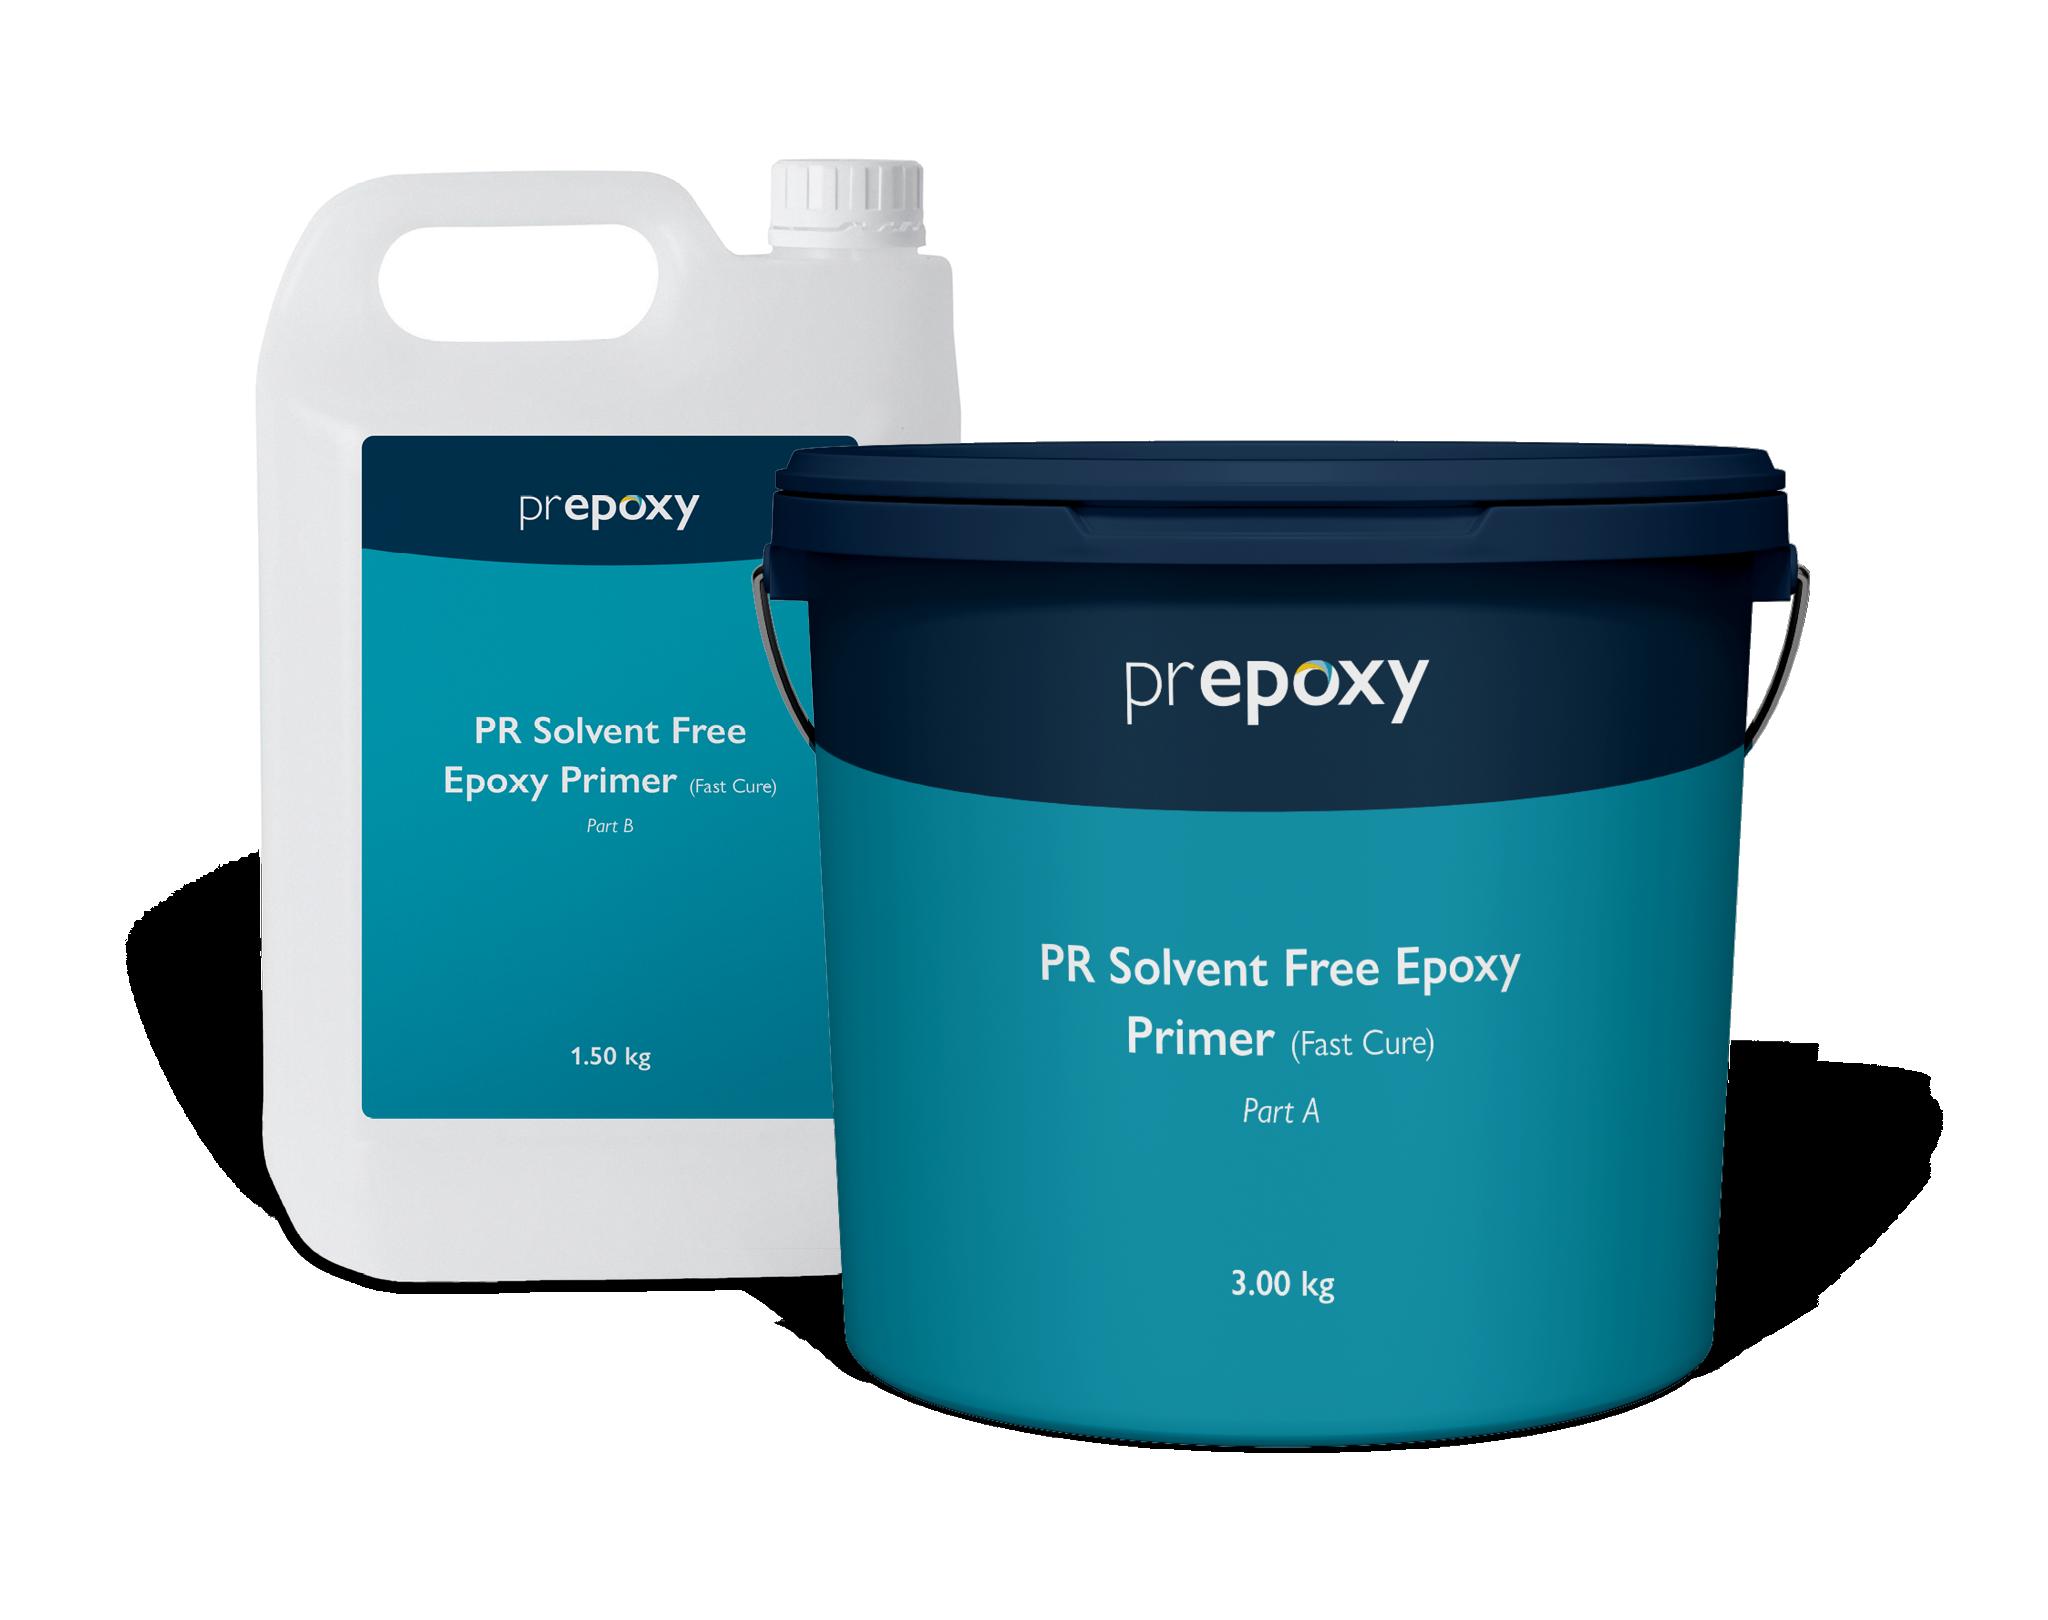 PR Solvent Free Epoxy Primer (Fast Cure)